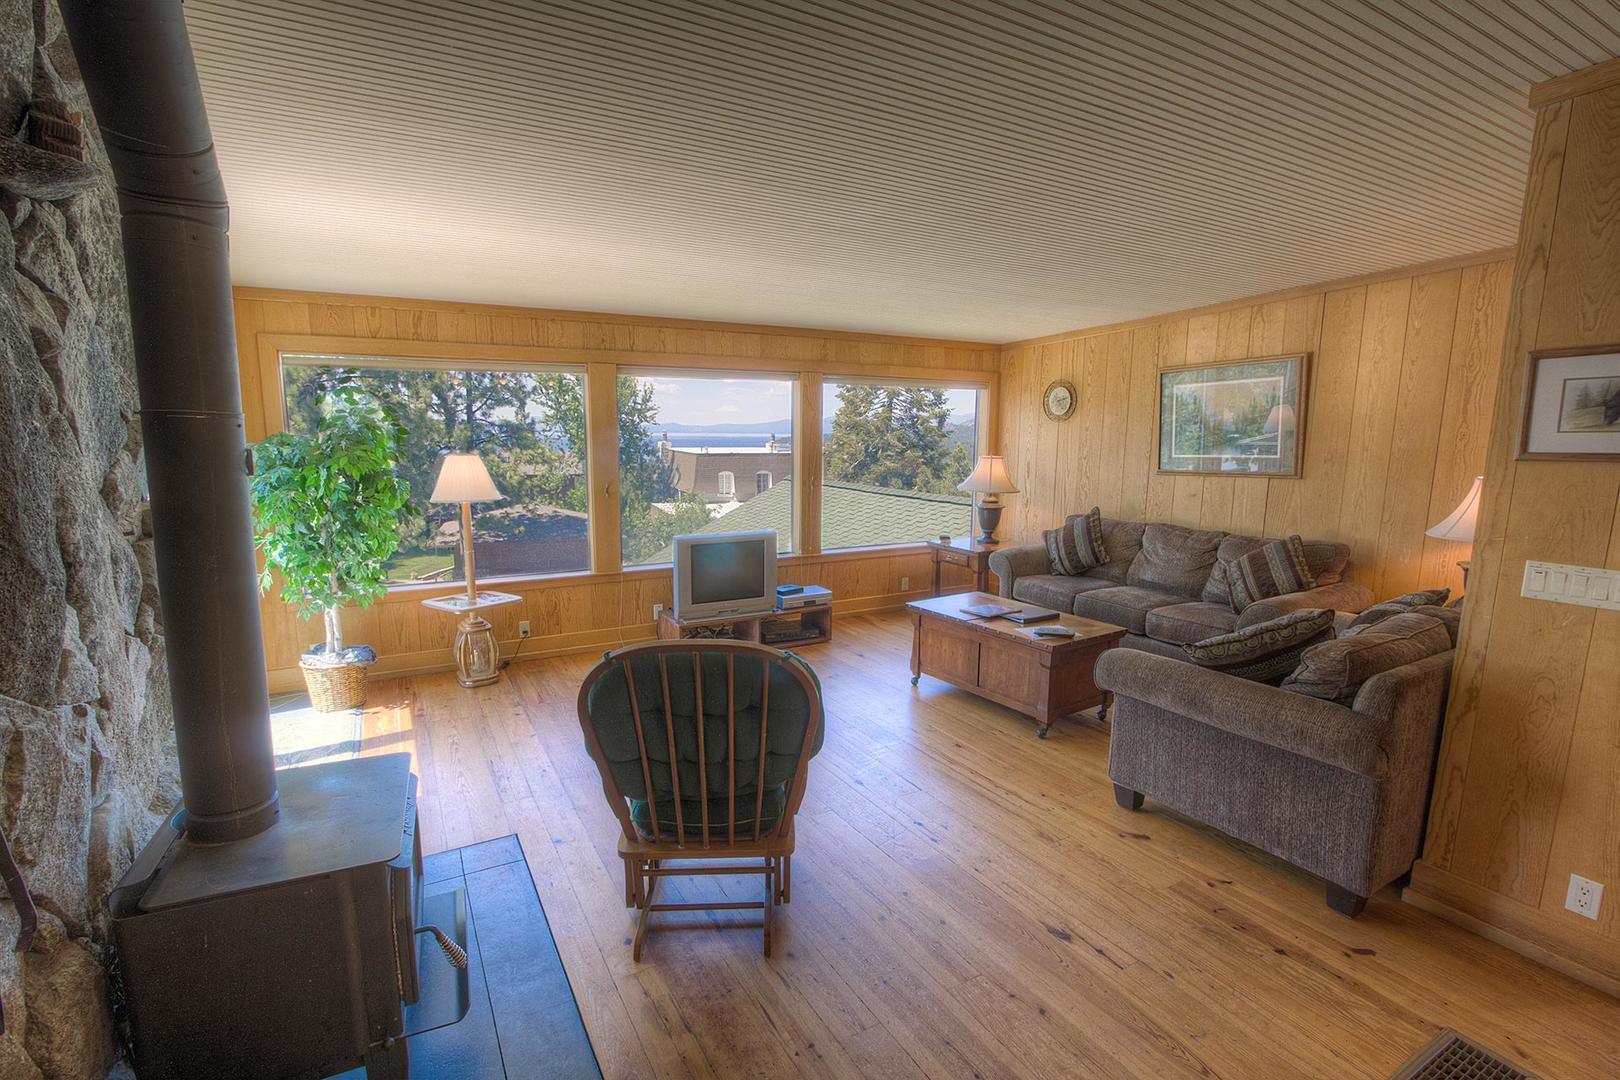 hch1202 living room